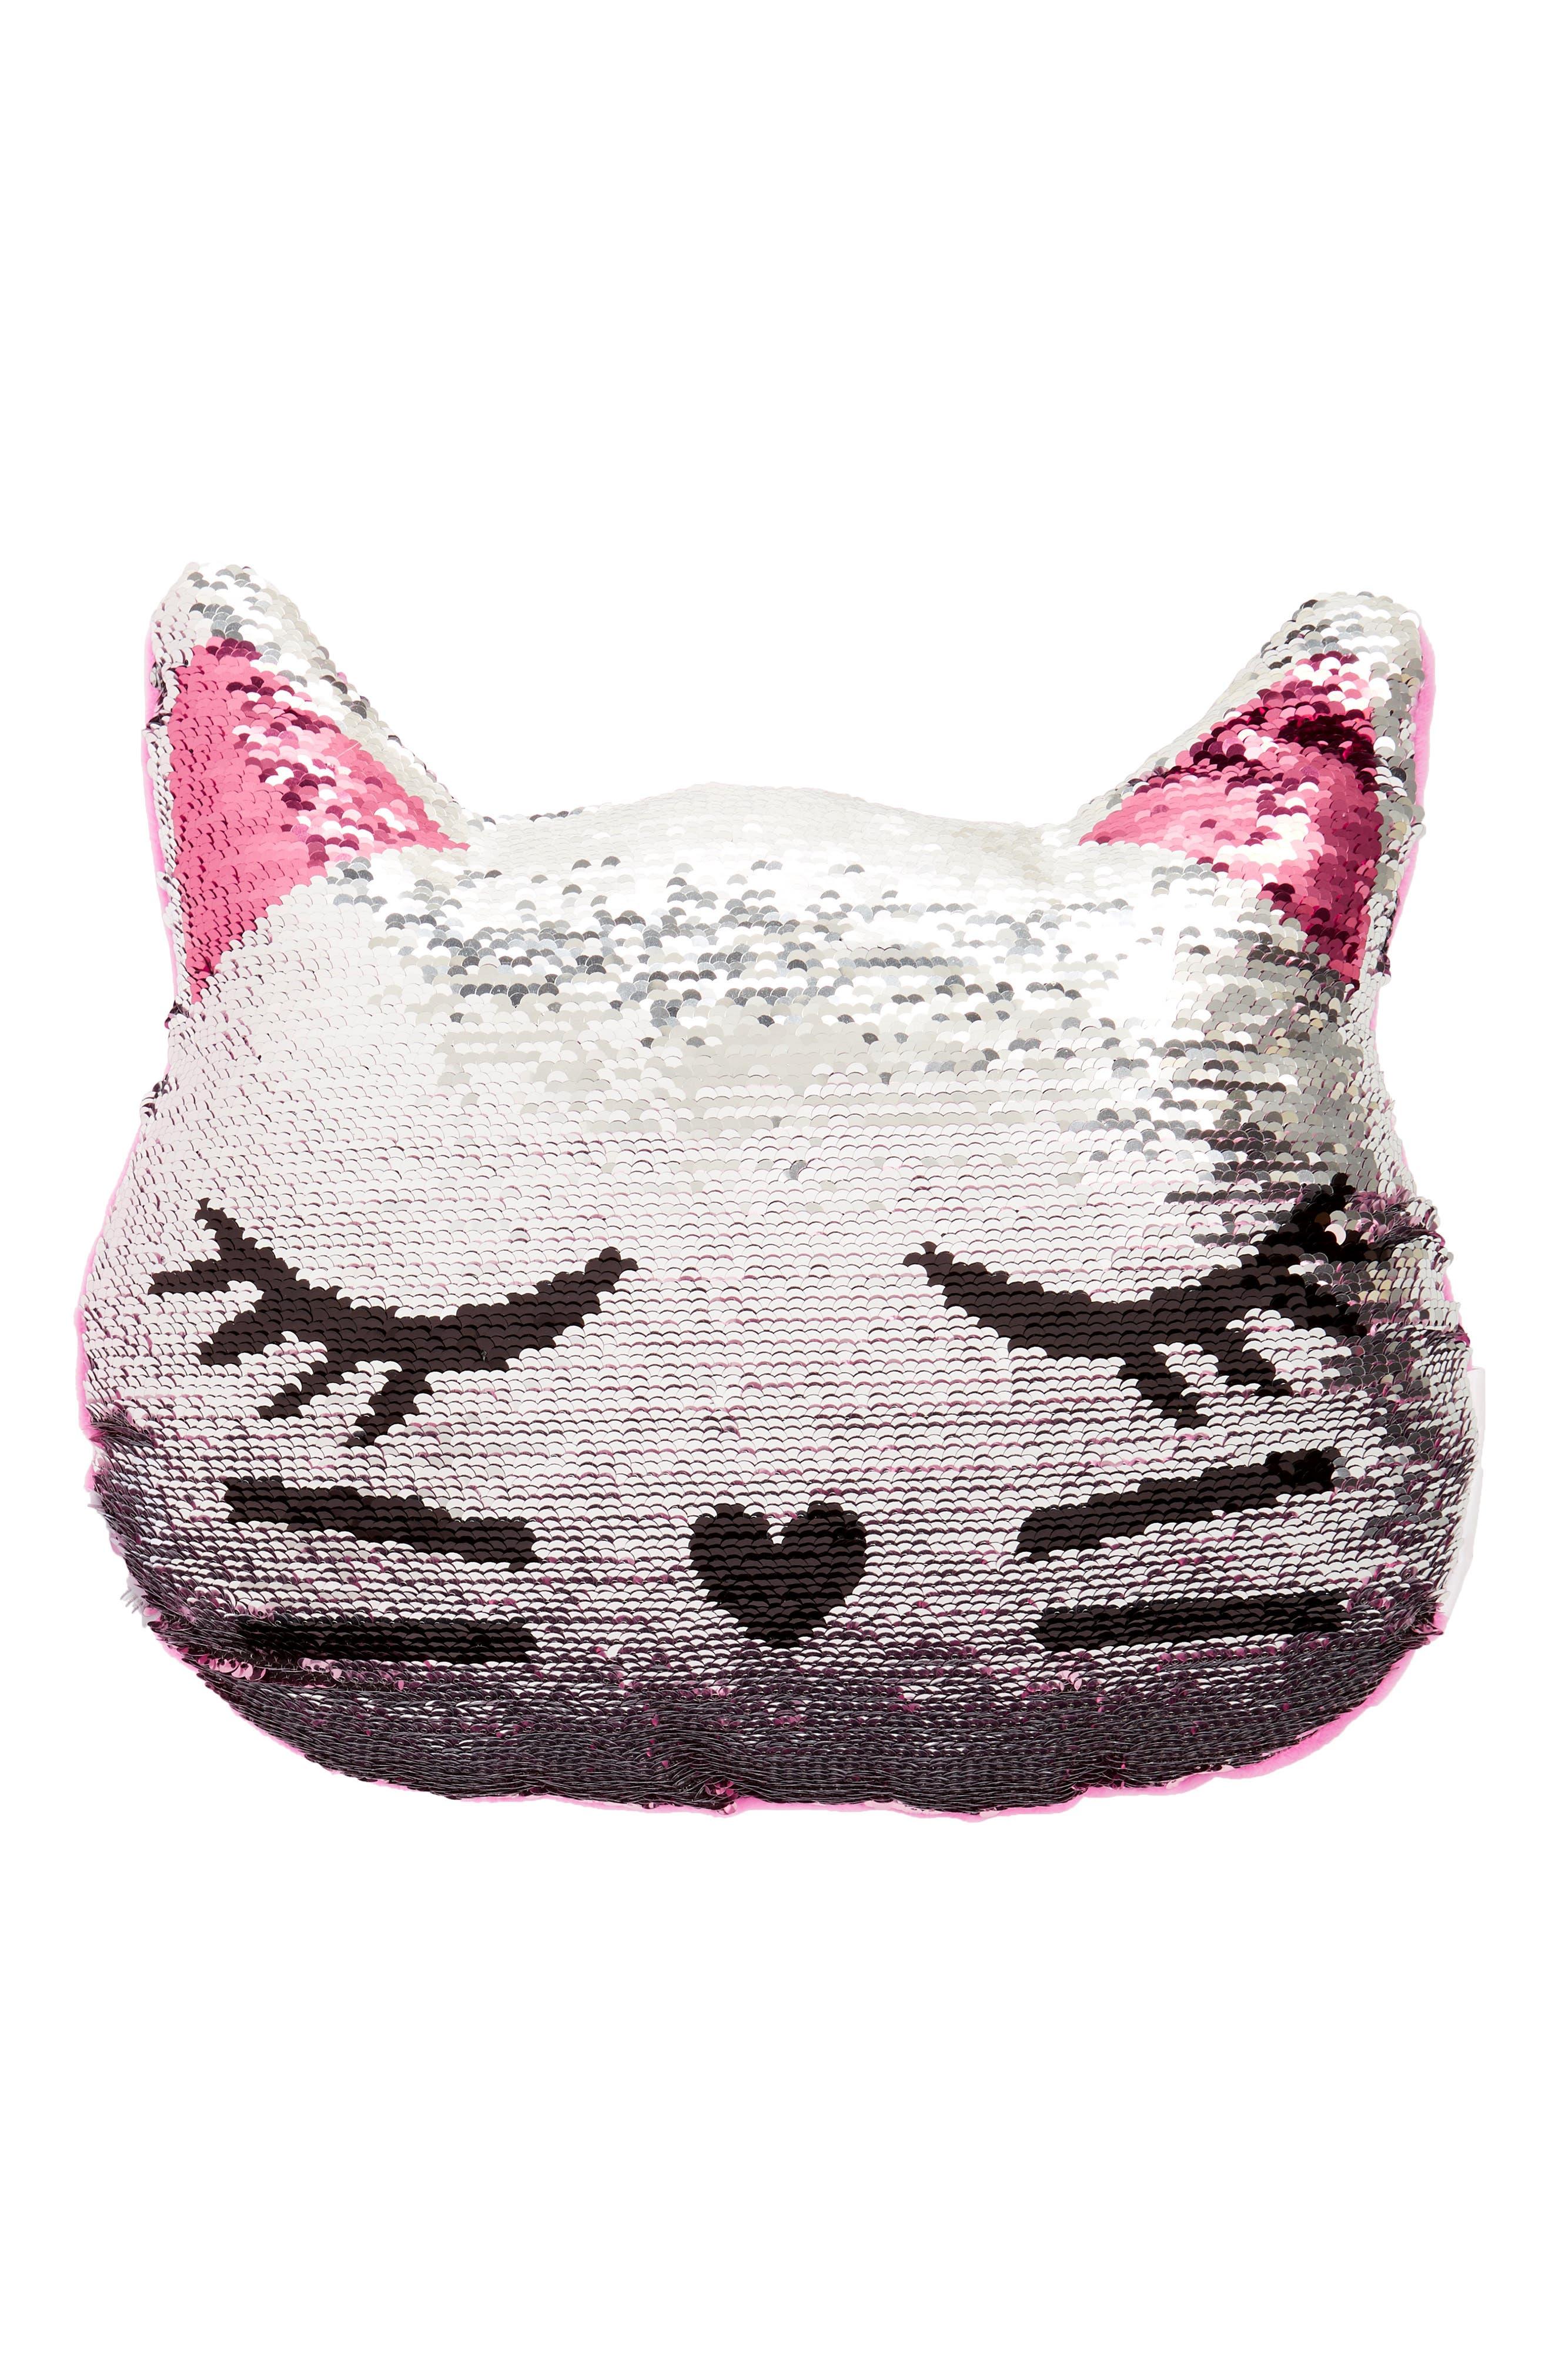 Reversible Sequin Cat Pillow,                             Alternate thumbnail 3, color,                             Silver Combo